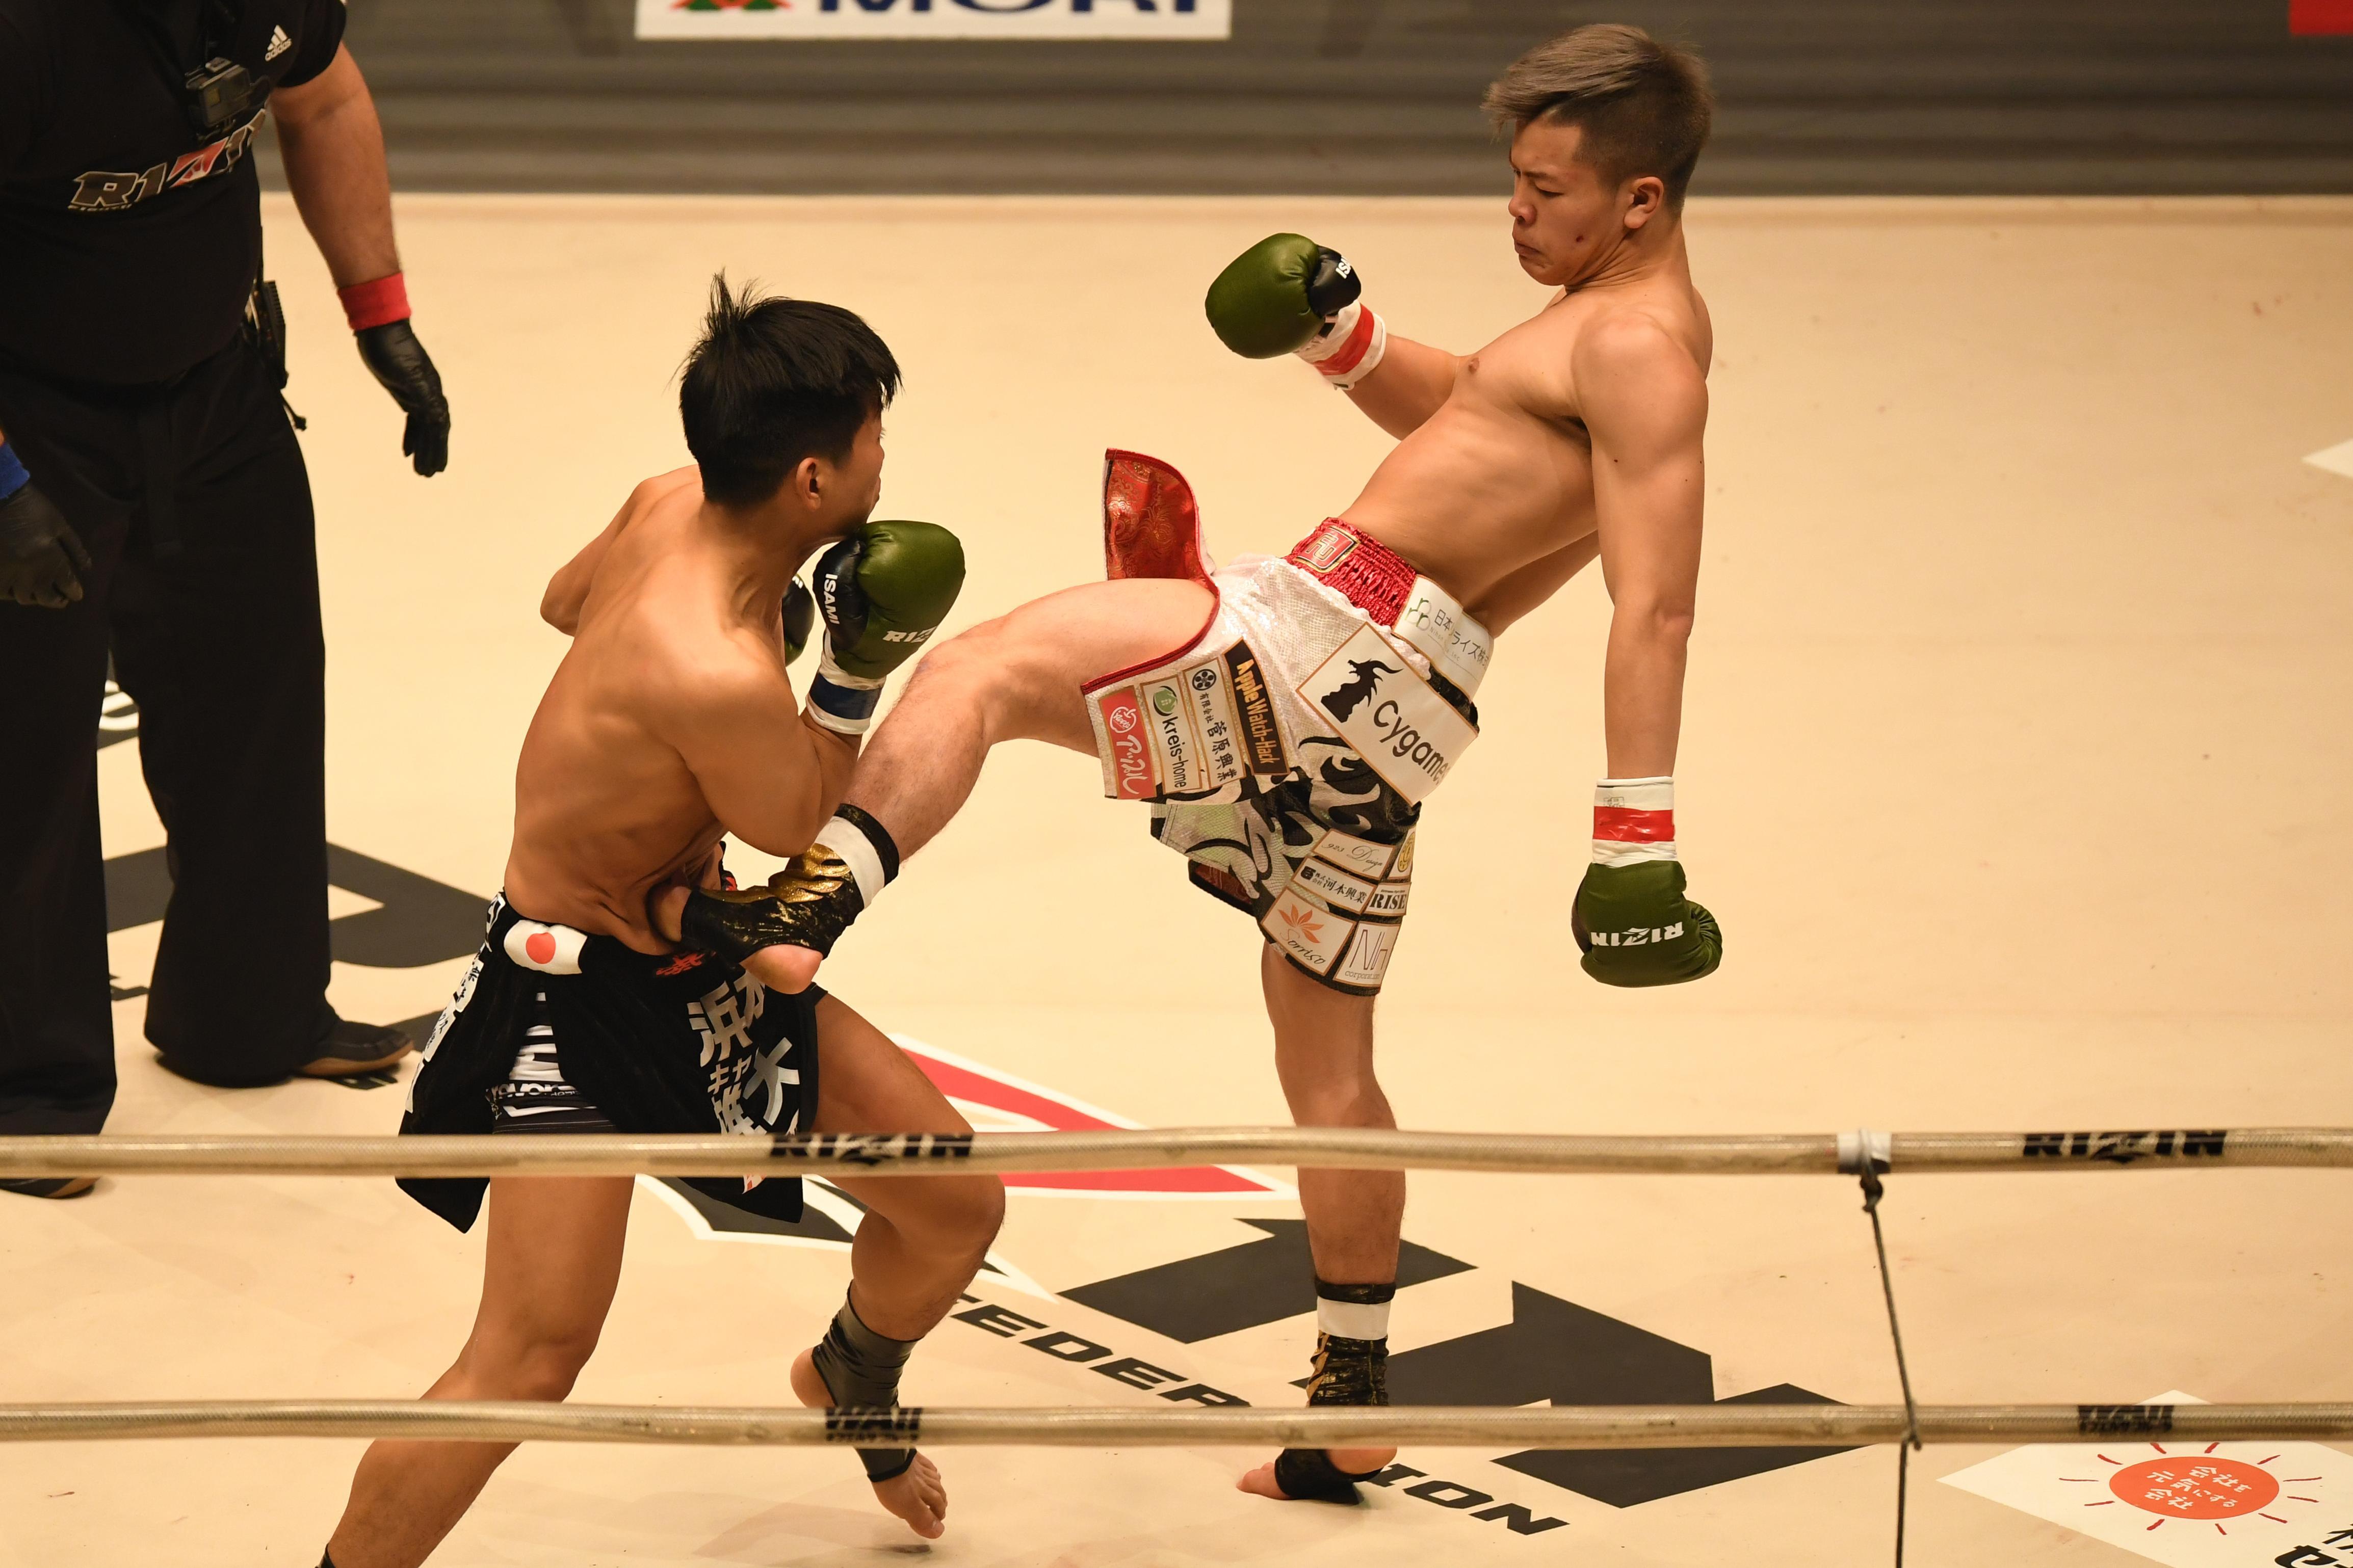 Tenshin Nasukawa will fight Floyd Mayweather on New Year's Eve in Japan